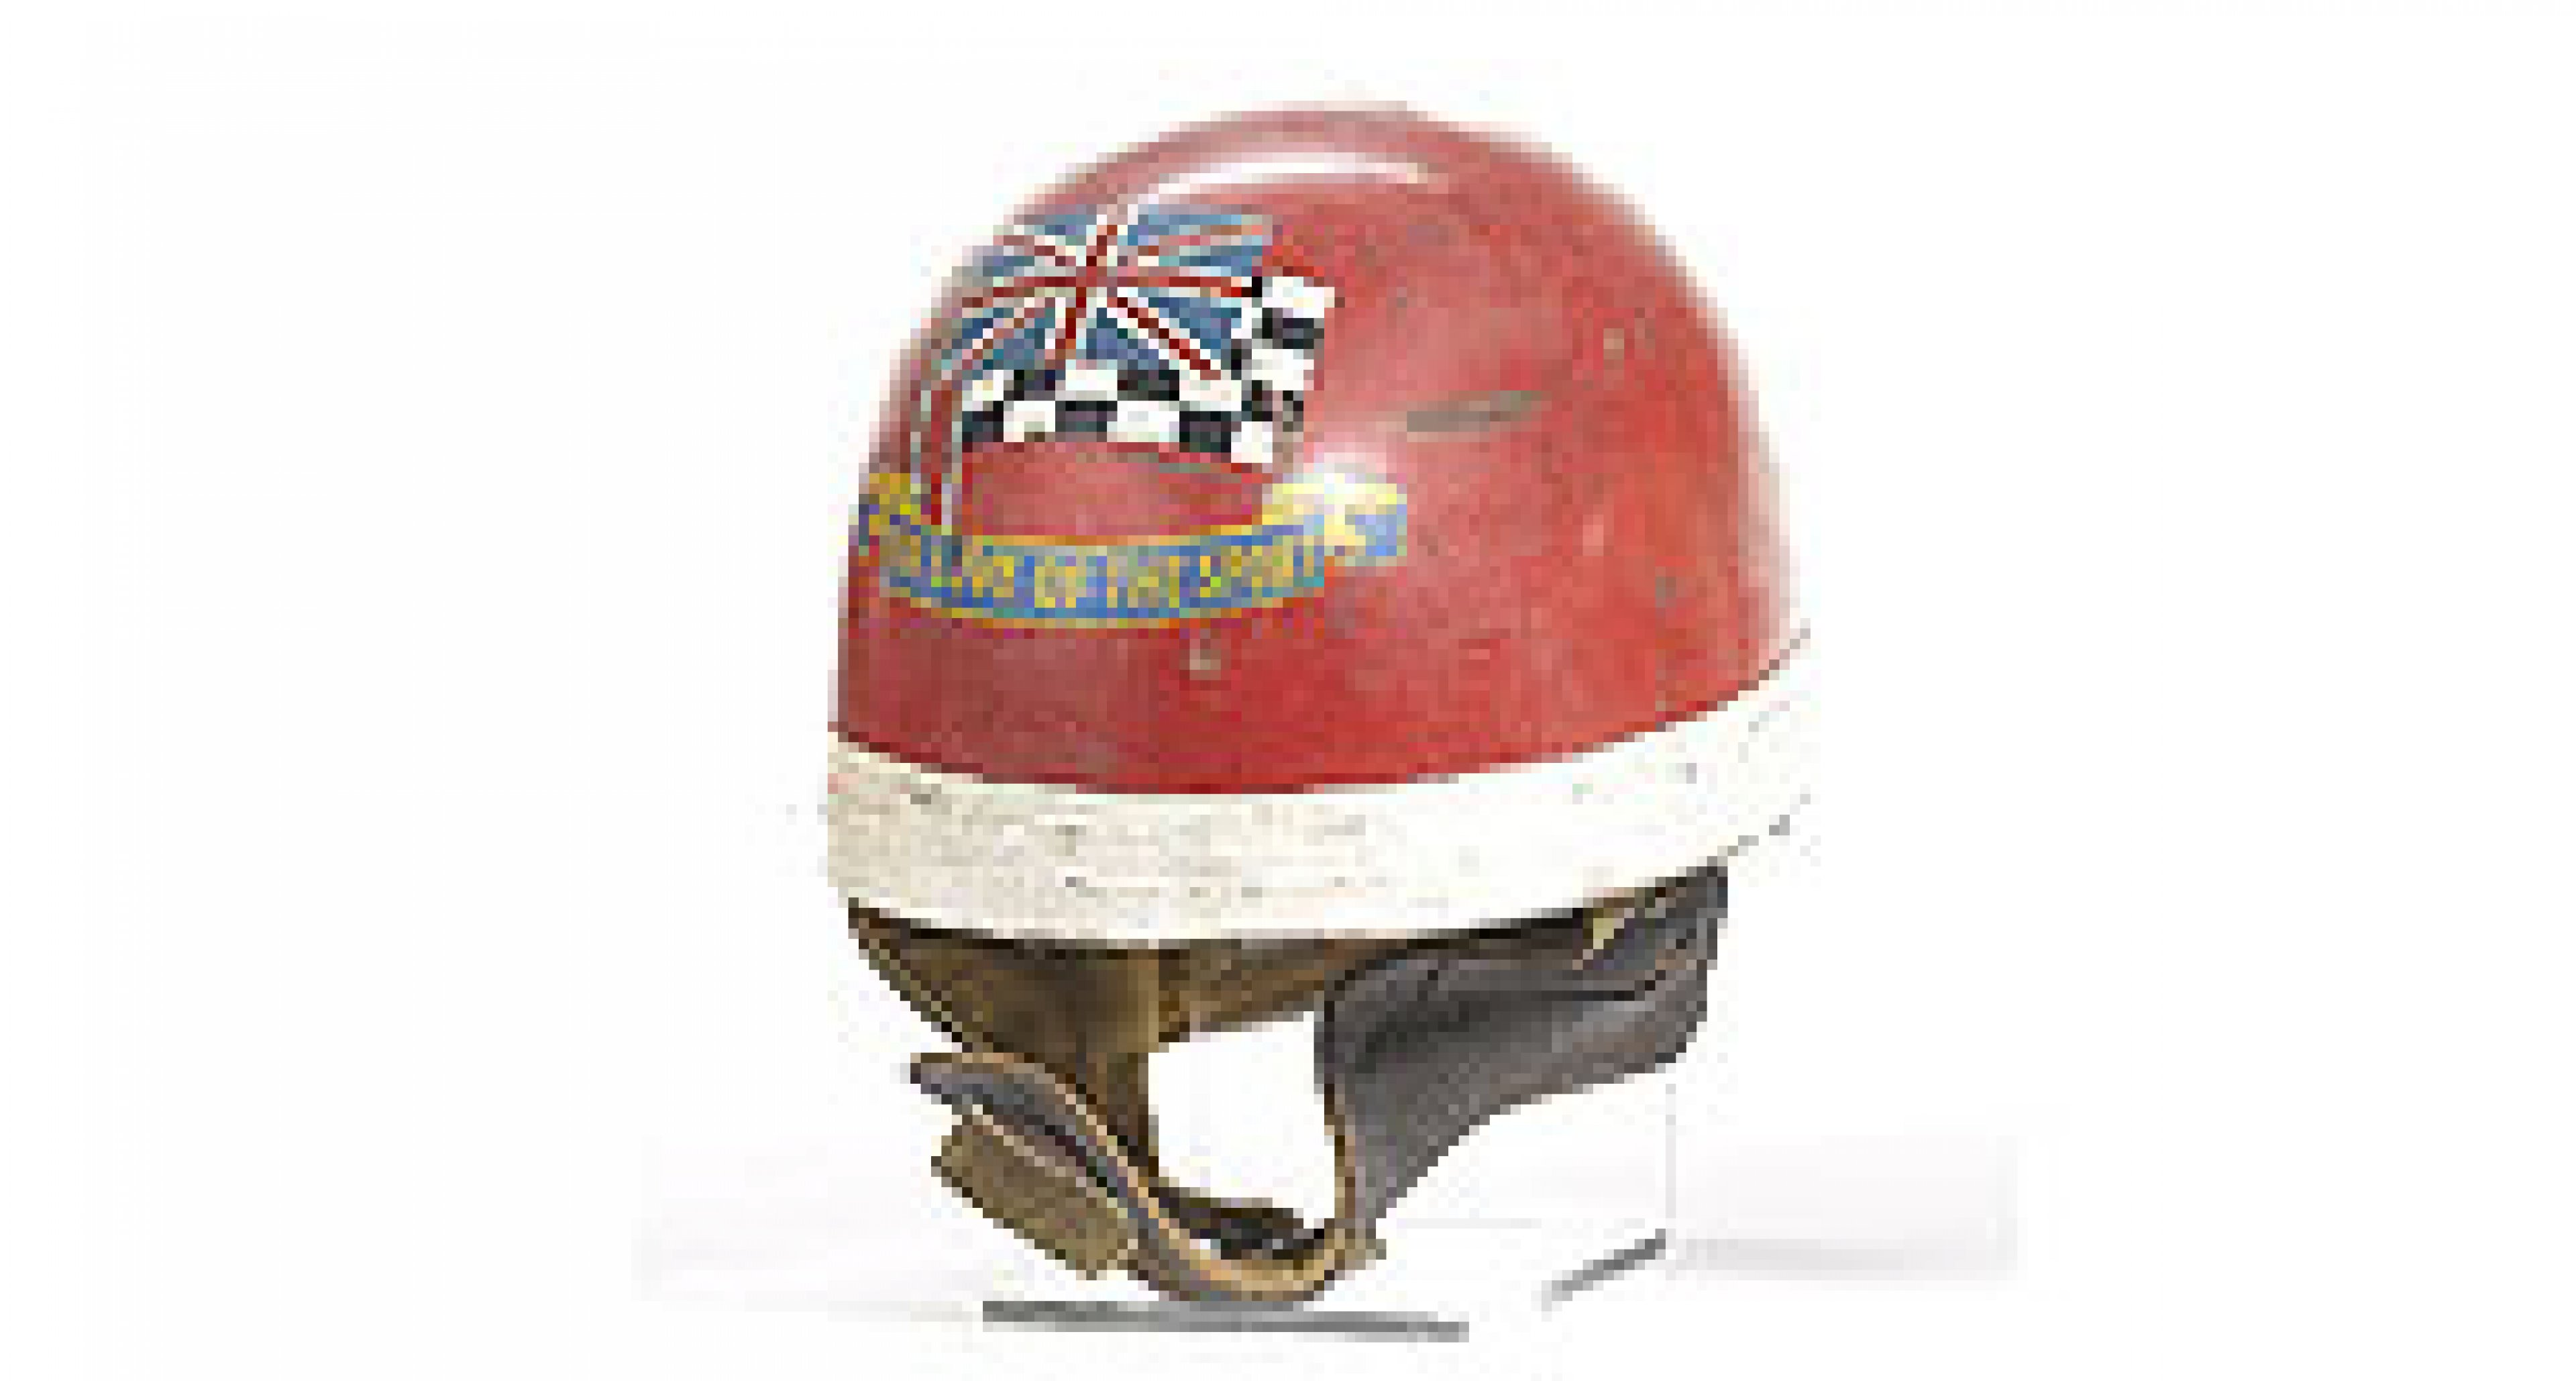 Vintage Motorcycle Helmets: Better stylish than safe